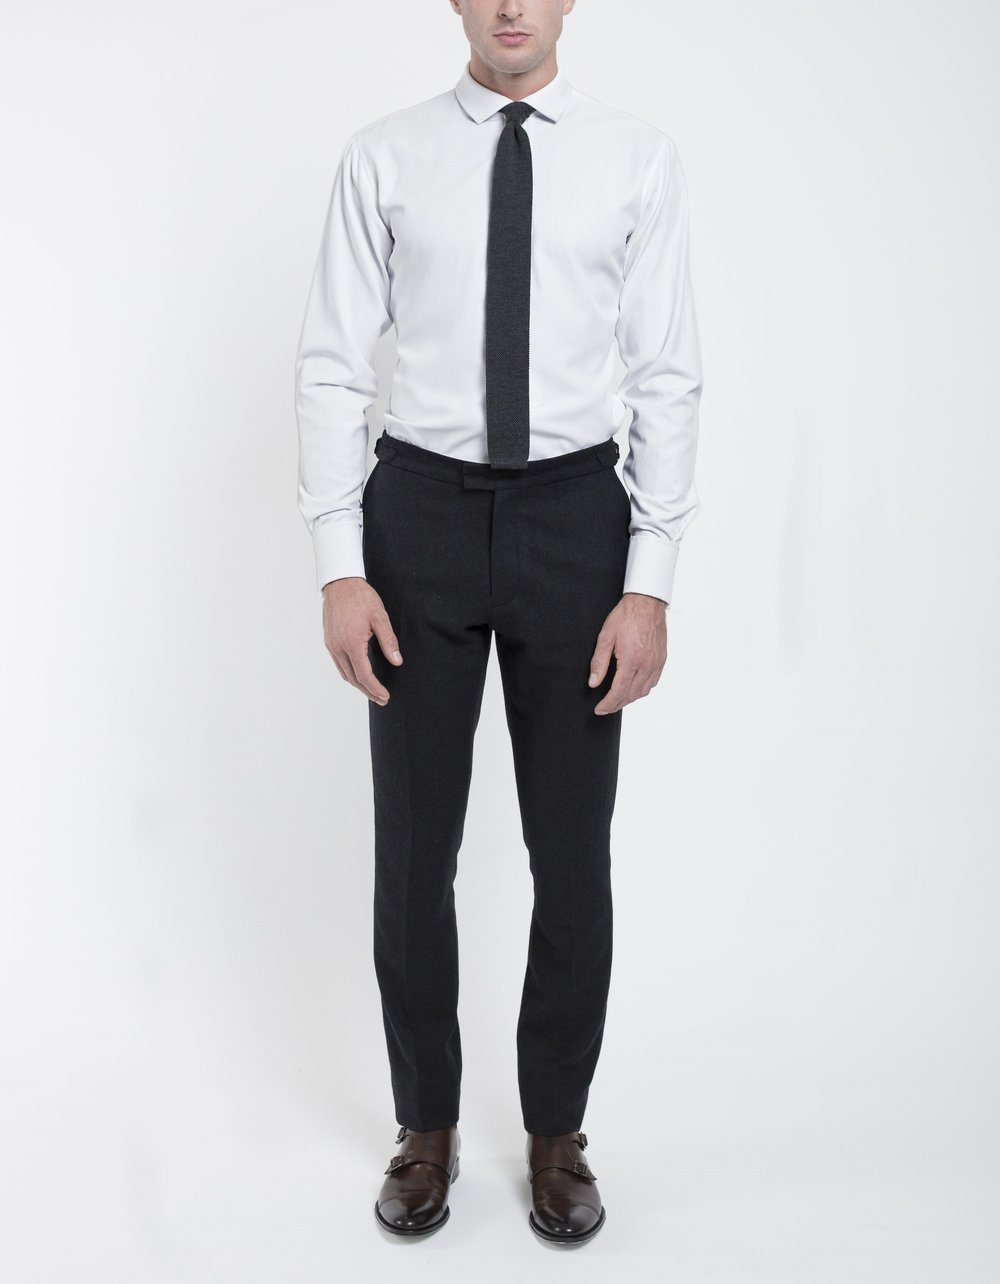 Lynch & Mason - Fellow Craft Double - Cuff Shirt.jpg